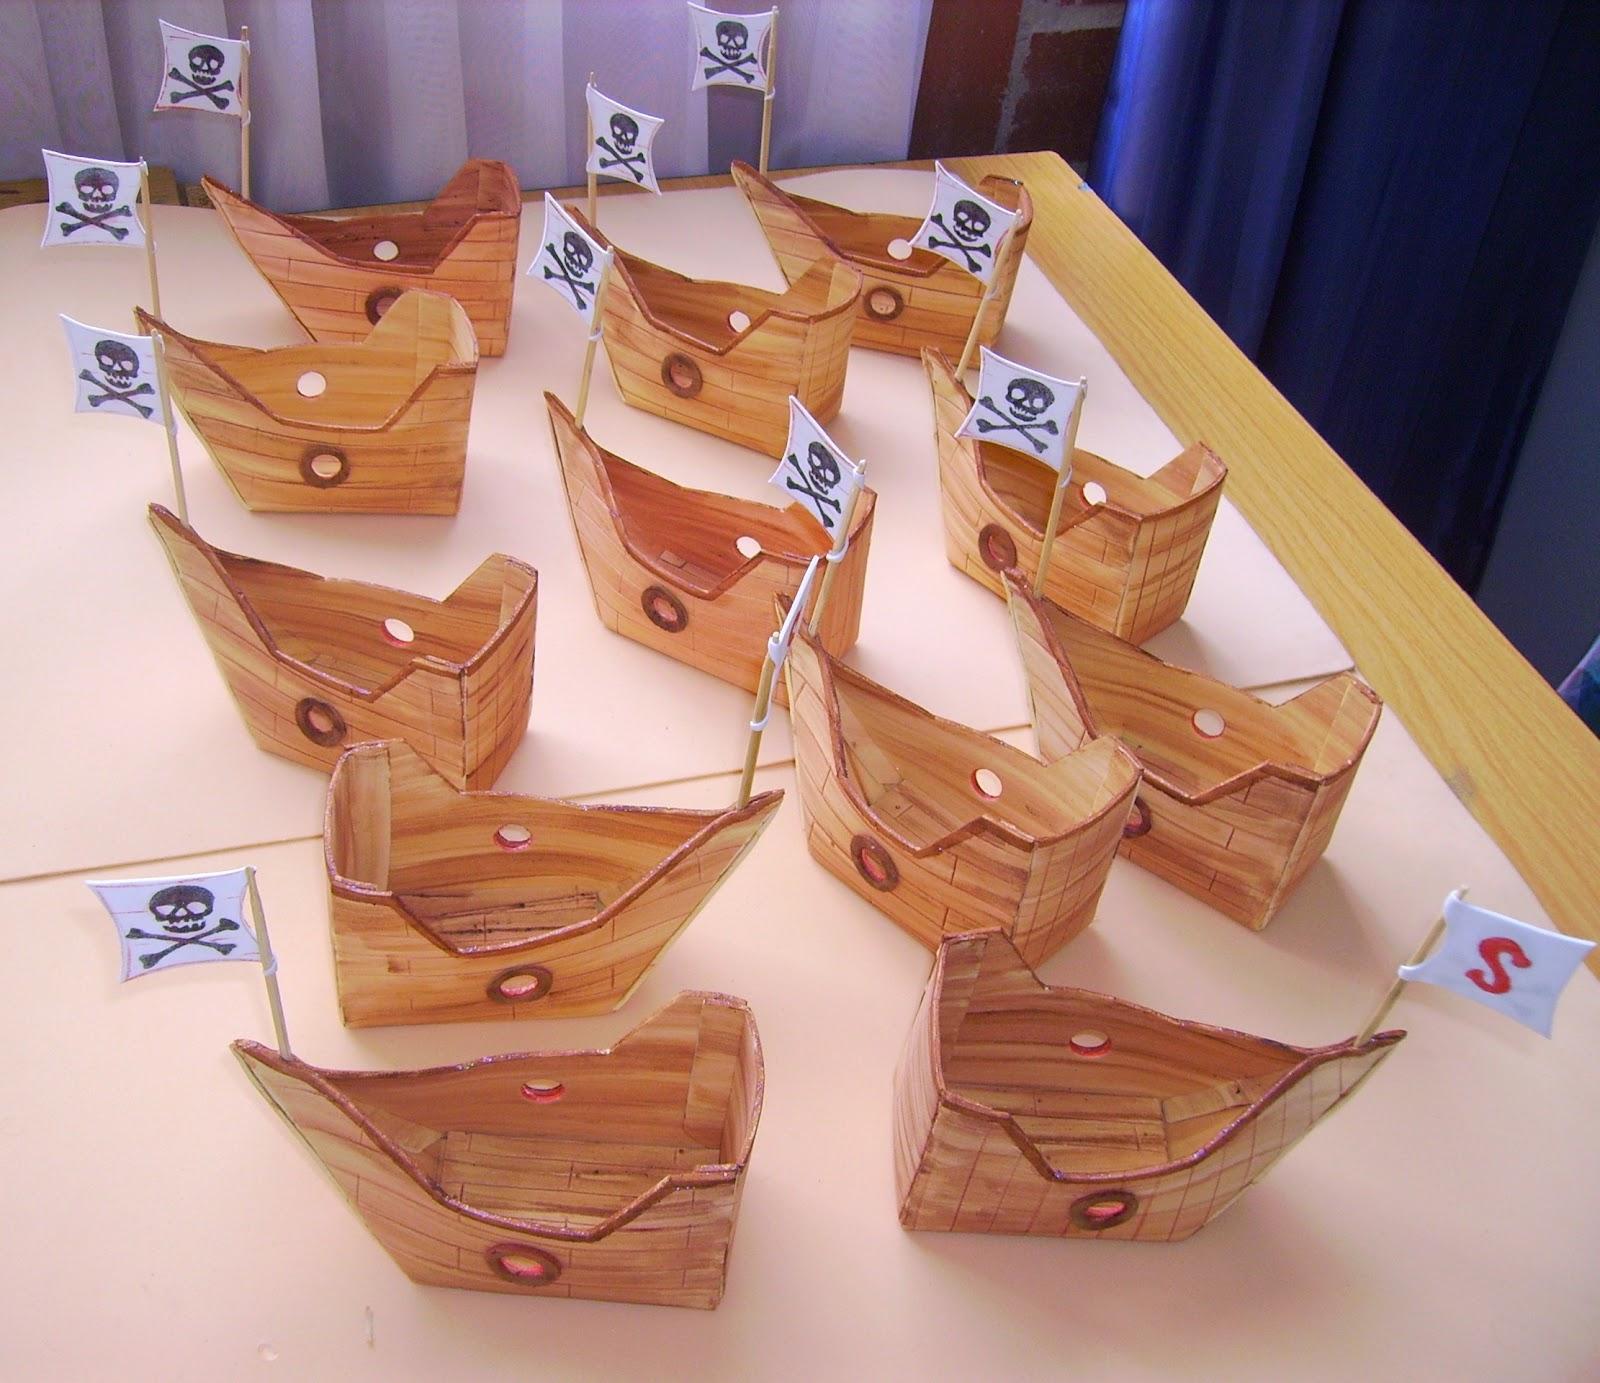 MARDEDI: Barcos Pirata - DULCEROS PARA FIESTA TEMATICA